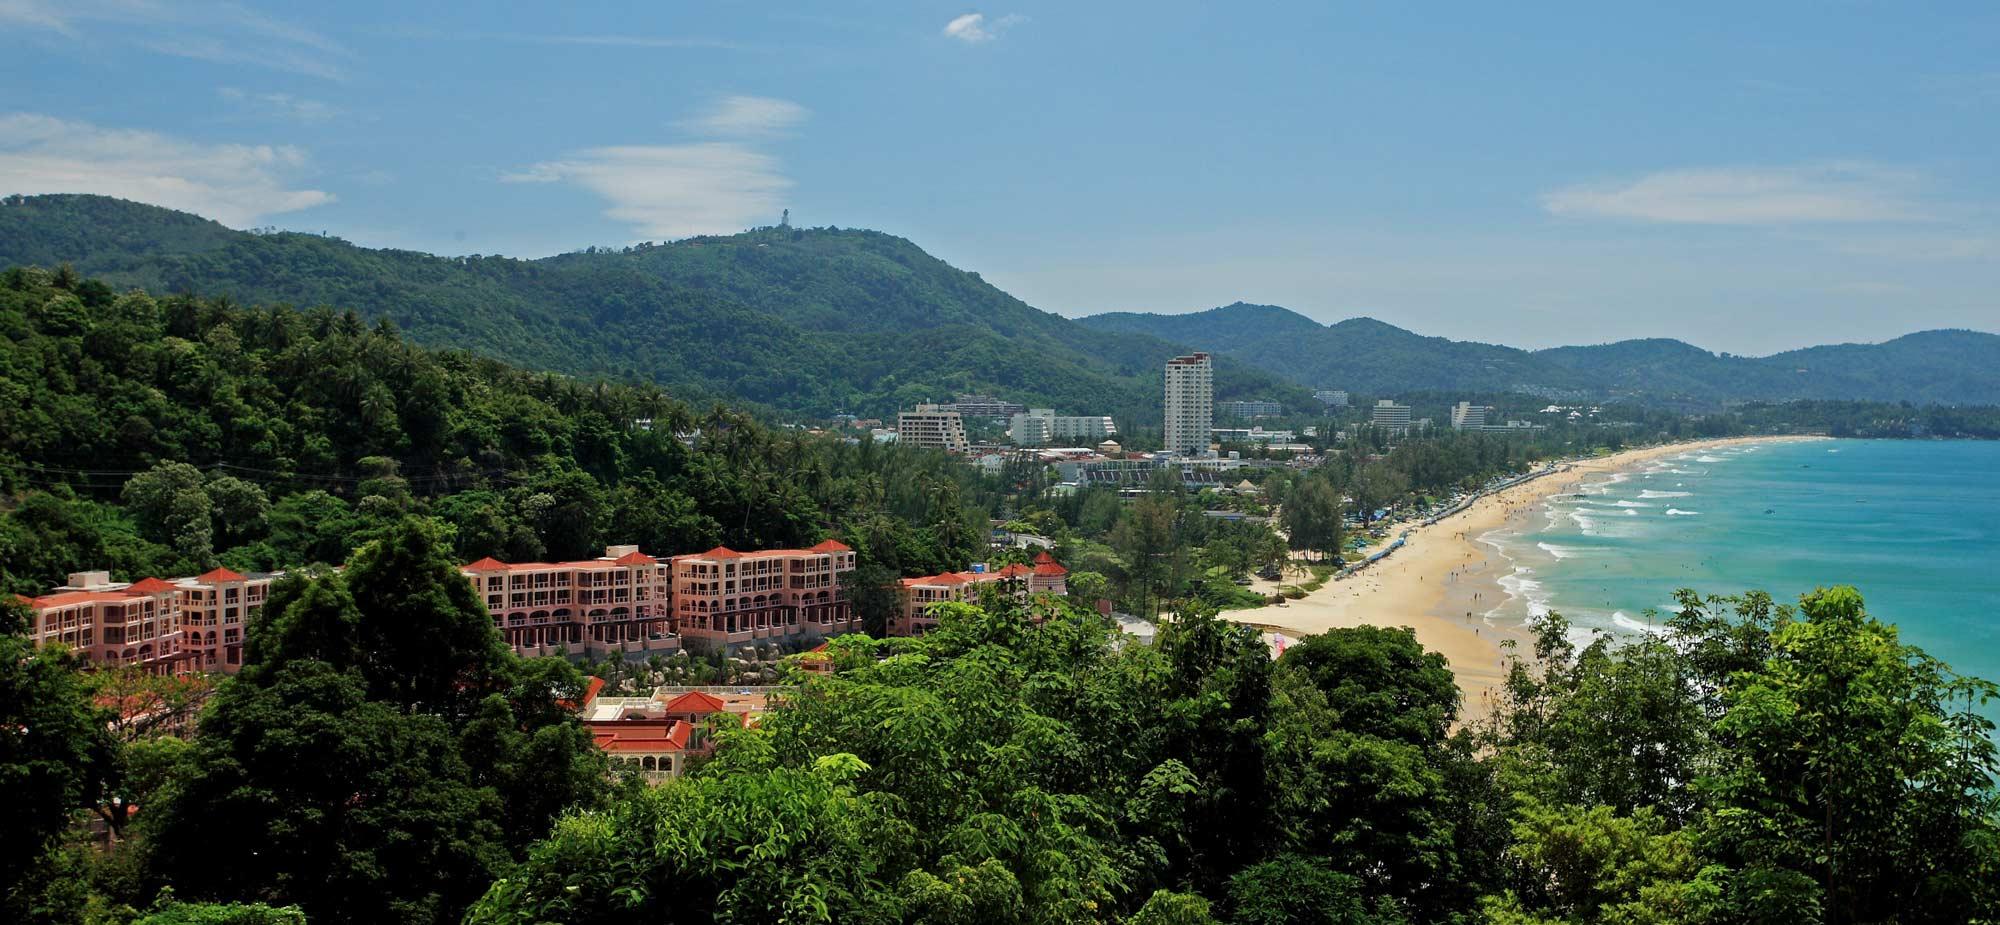 Centara Grand Beach Resort Phuket Contact Details